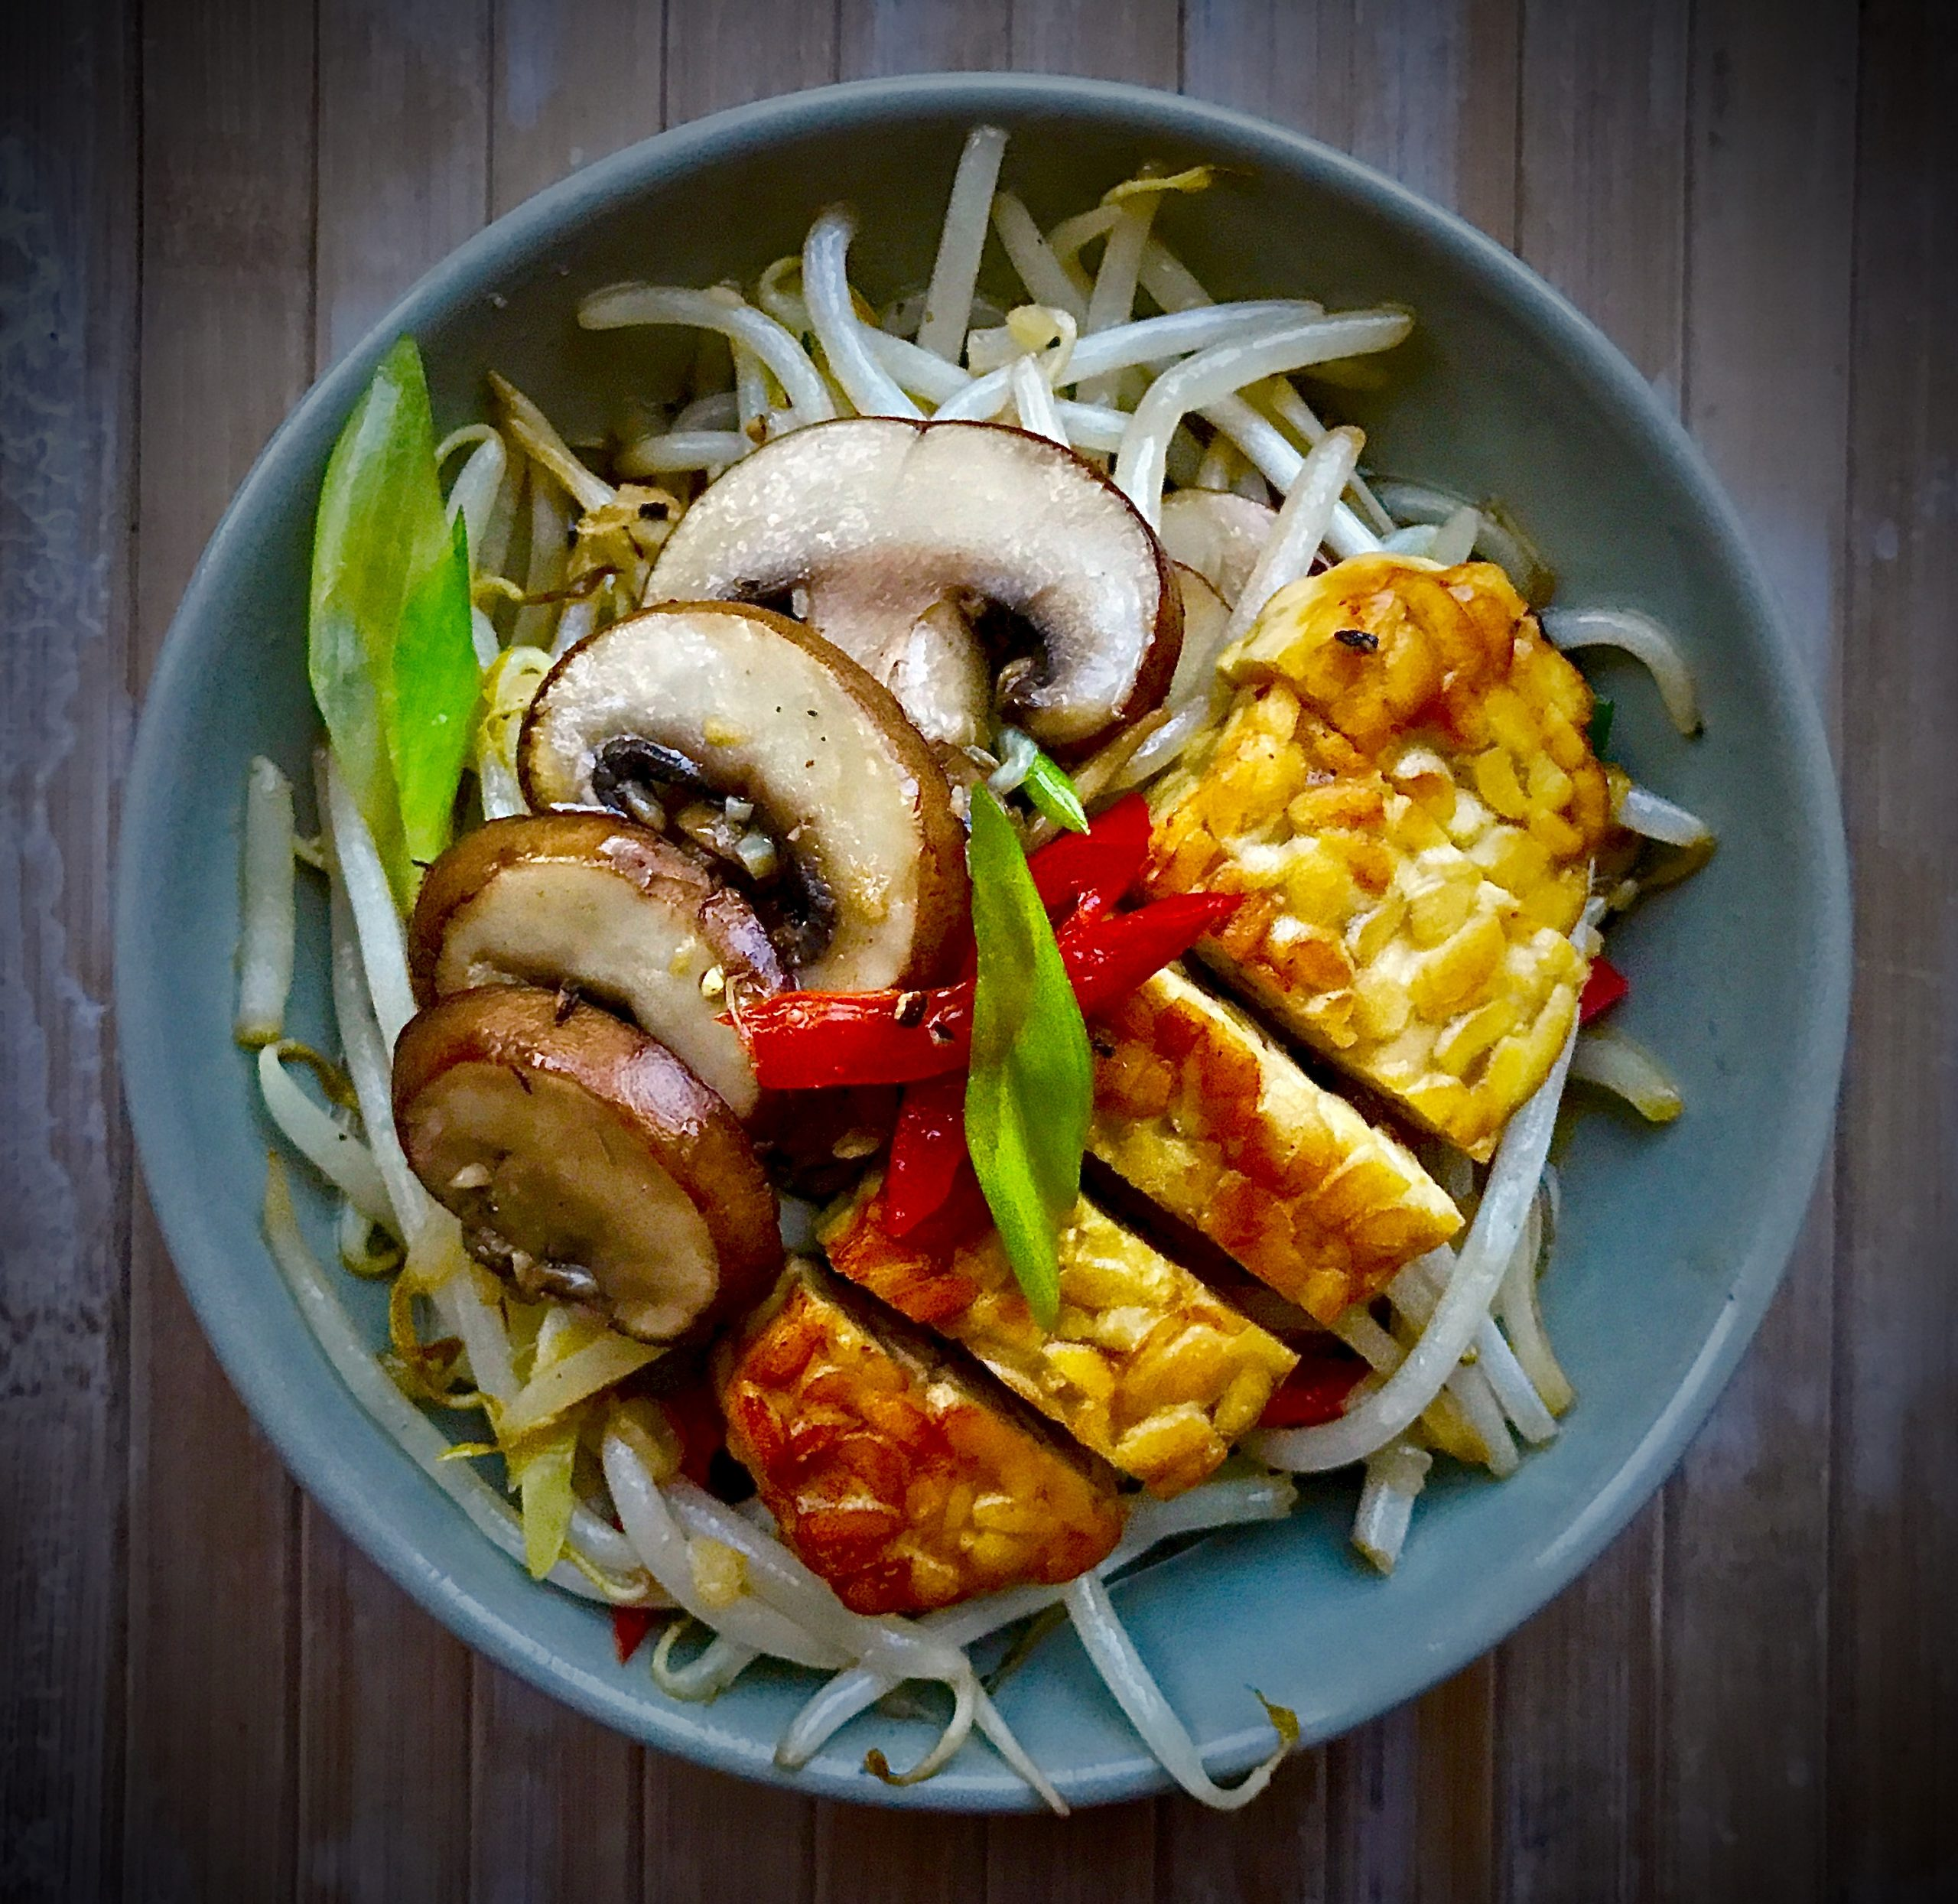 Beansprouts Stir-Fried (Vegan)